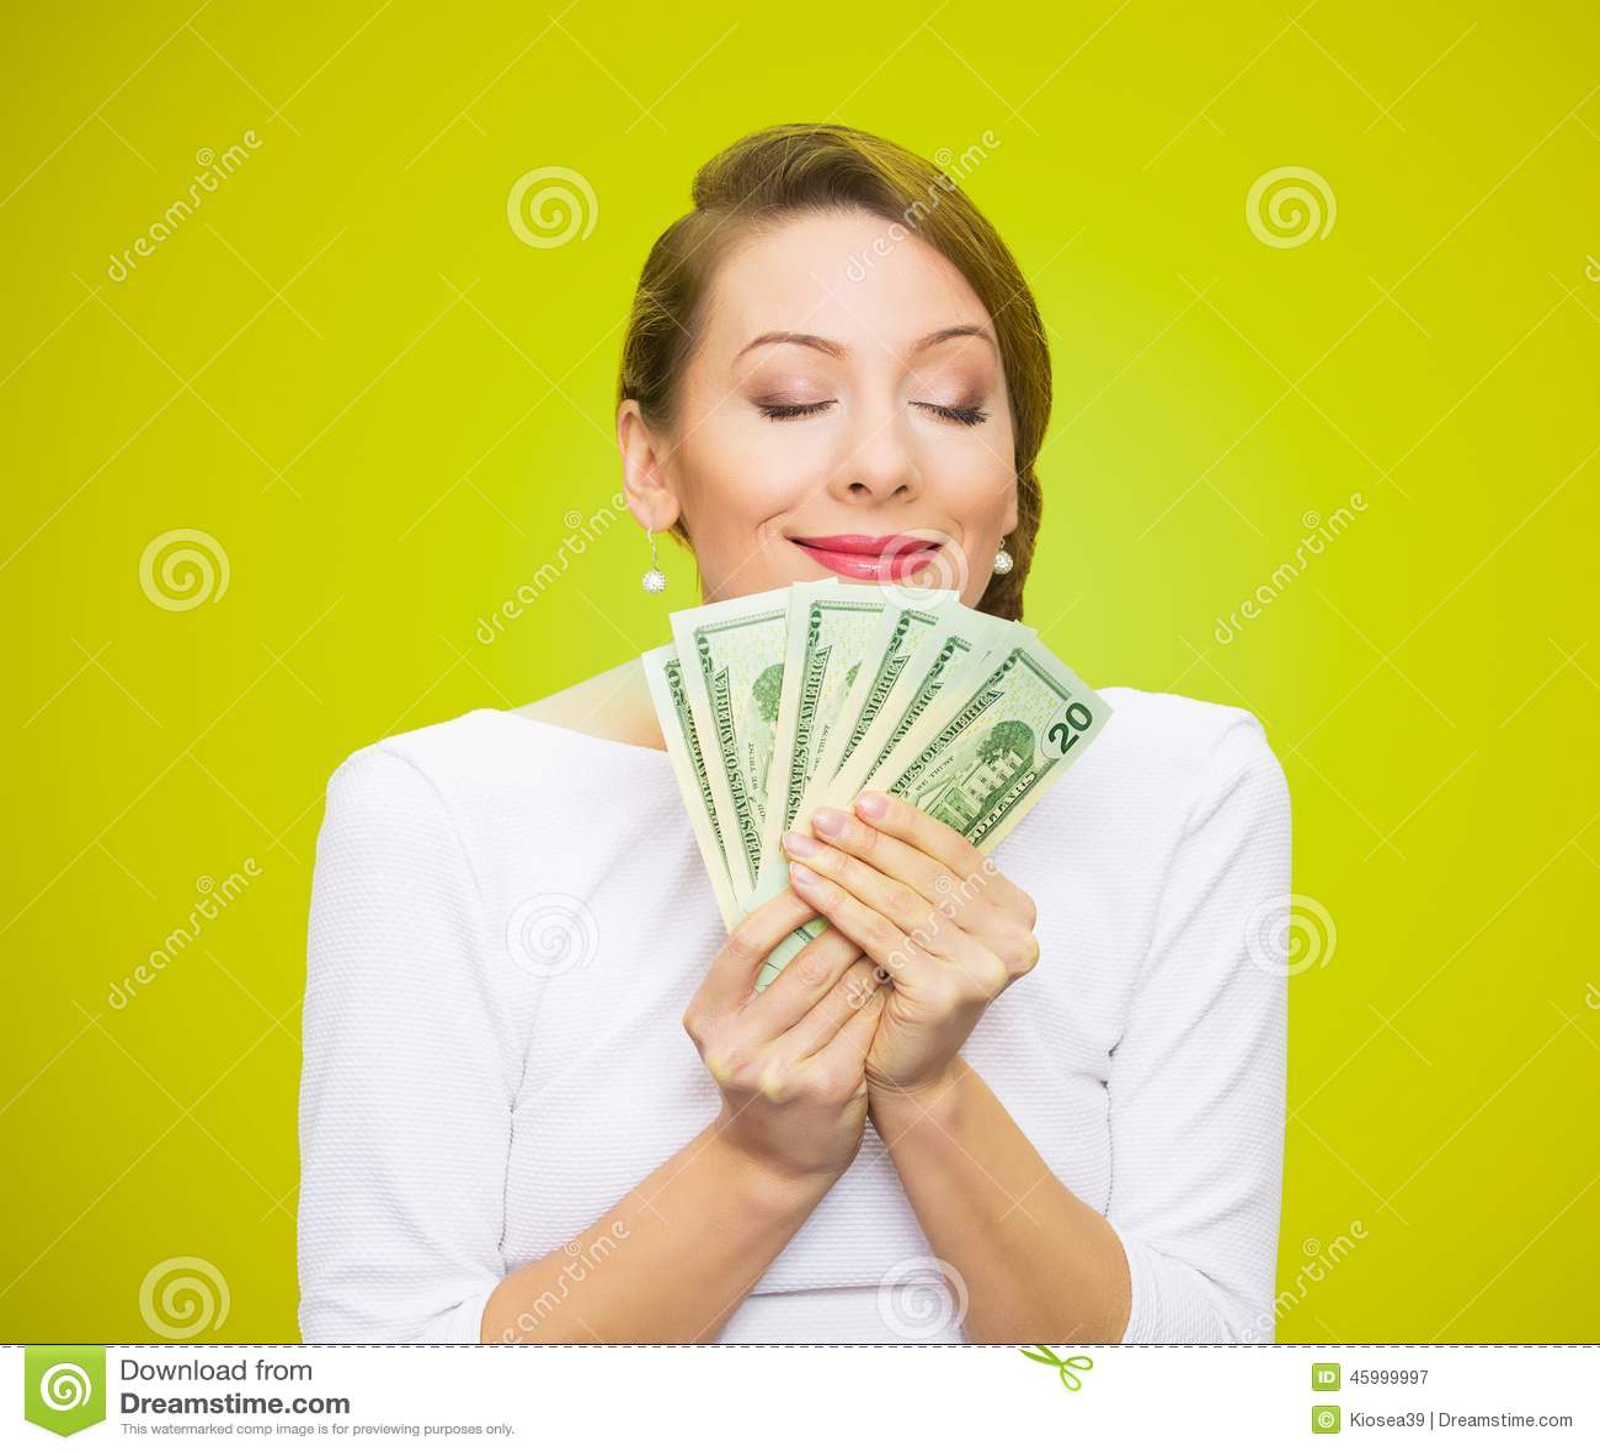 Woman loves money